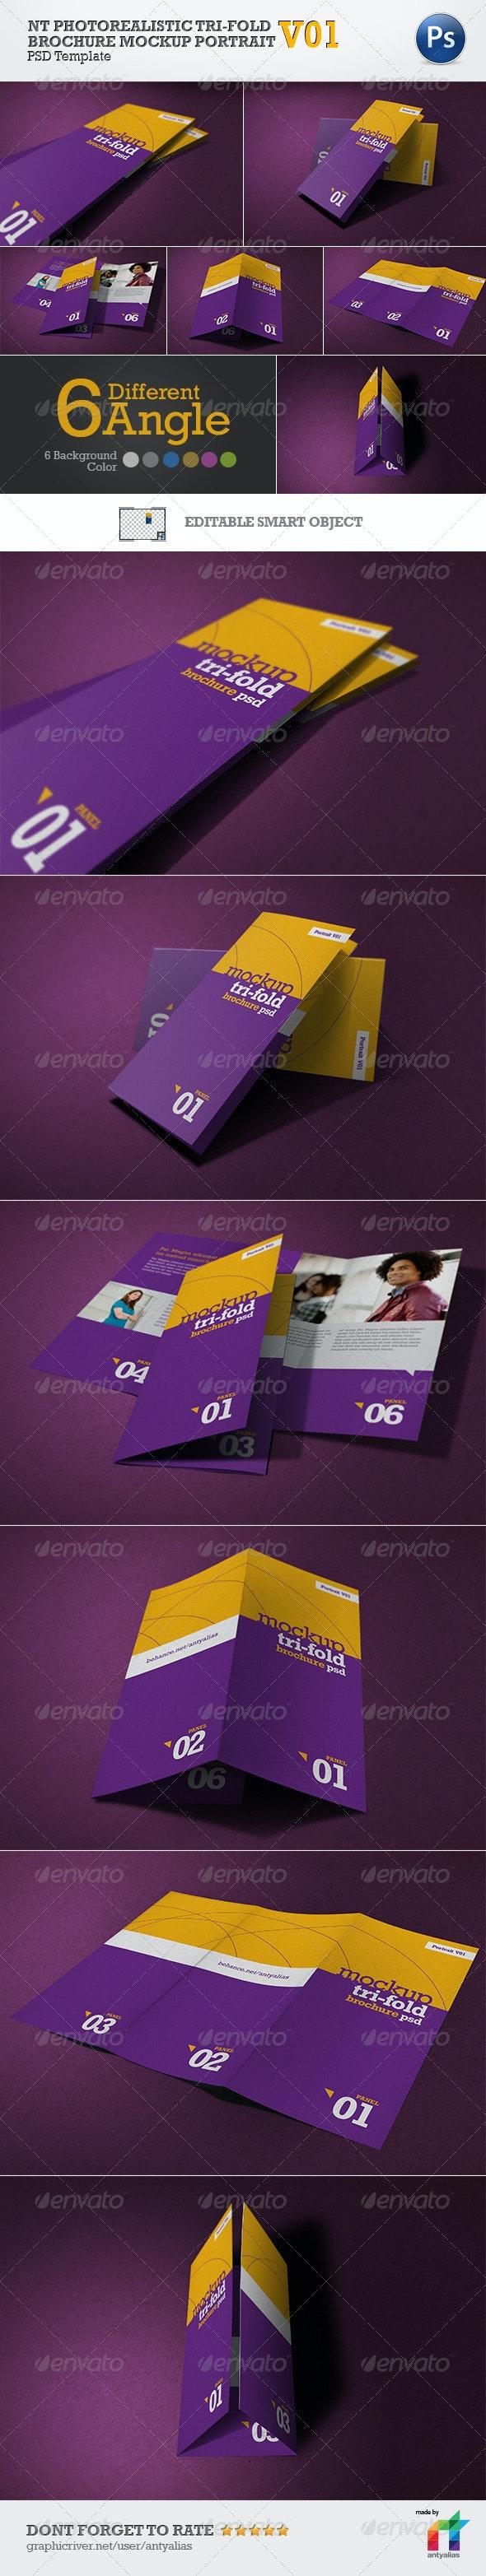 NT Photorealistic Tri-Fold Brochure Mockup - V01 - Print Product Mock-Ups